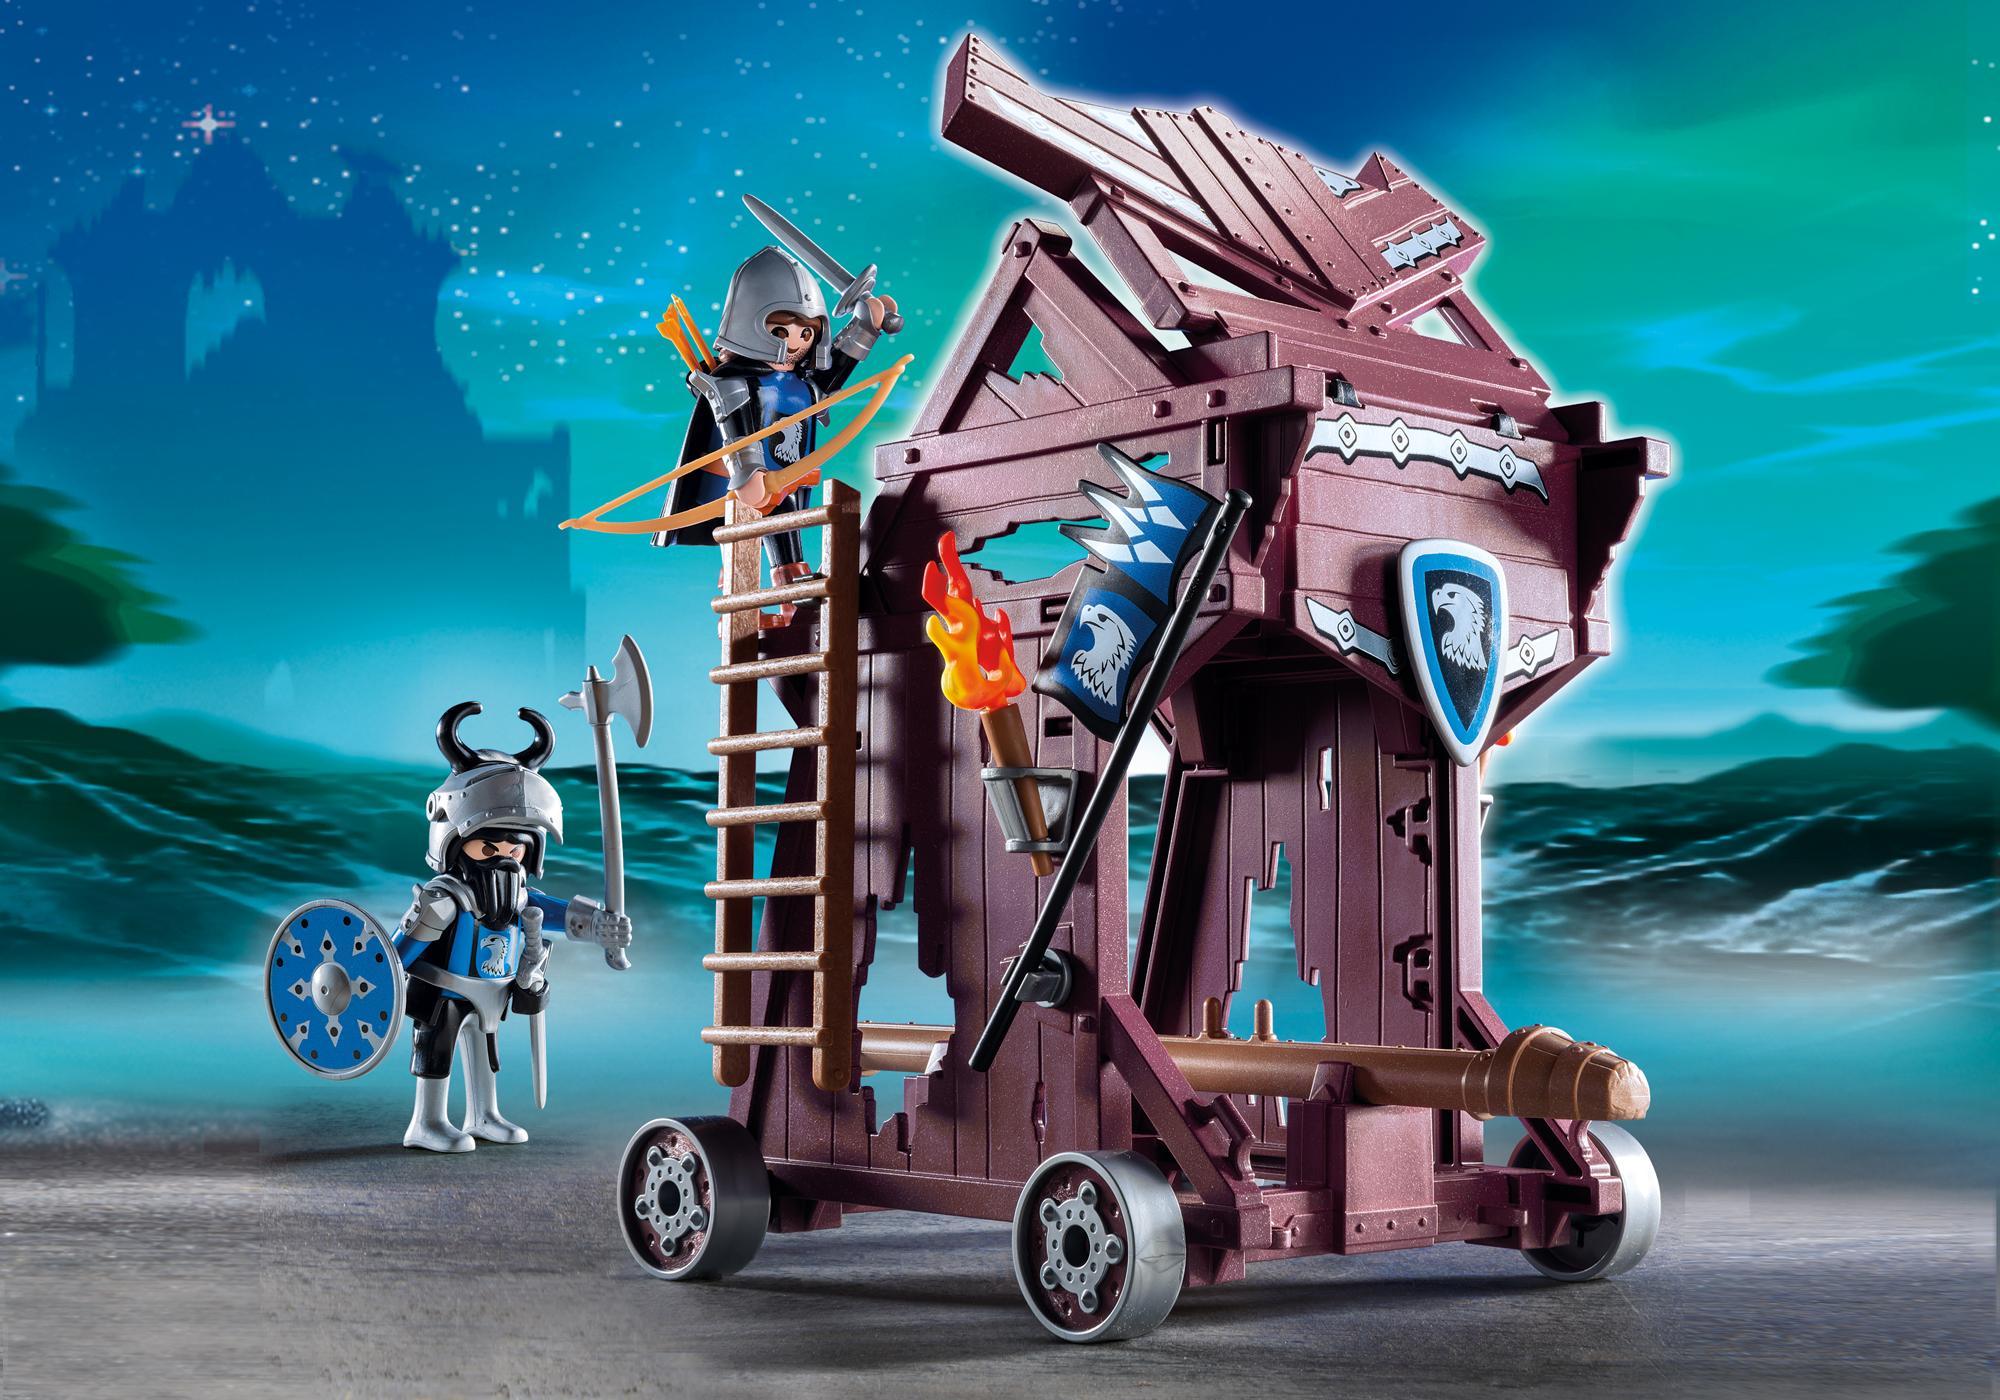 http://media.playmobil.com/i/playmobil/6628_product_detail/Соперничество Рыцарей: Рыцари Орла атакуют Башню